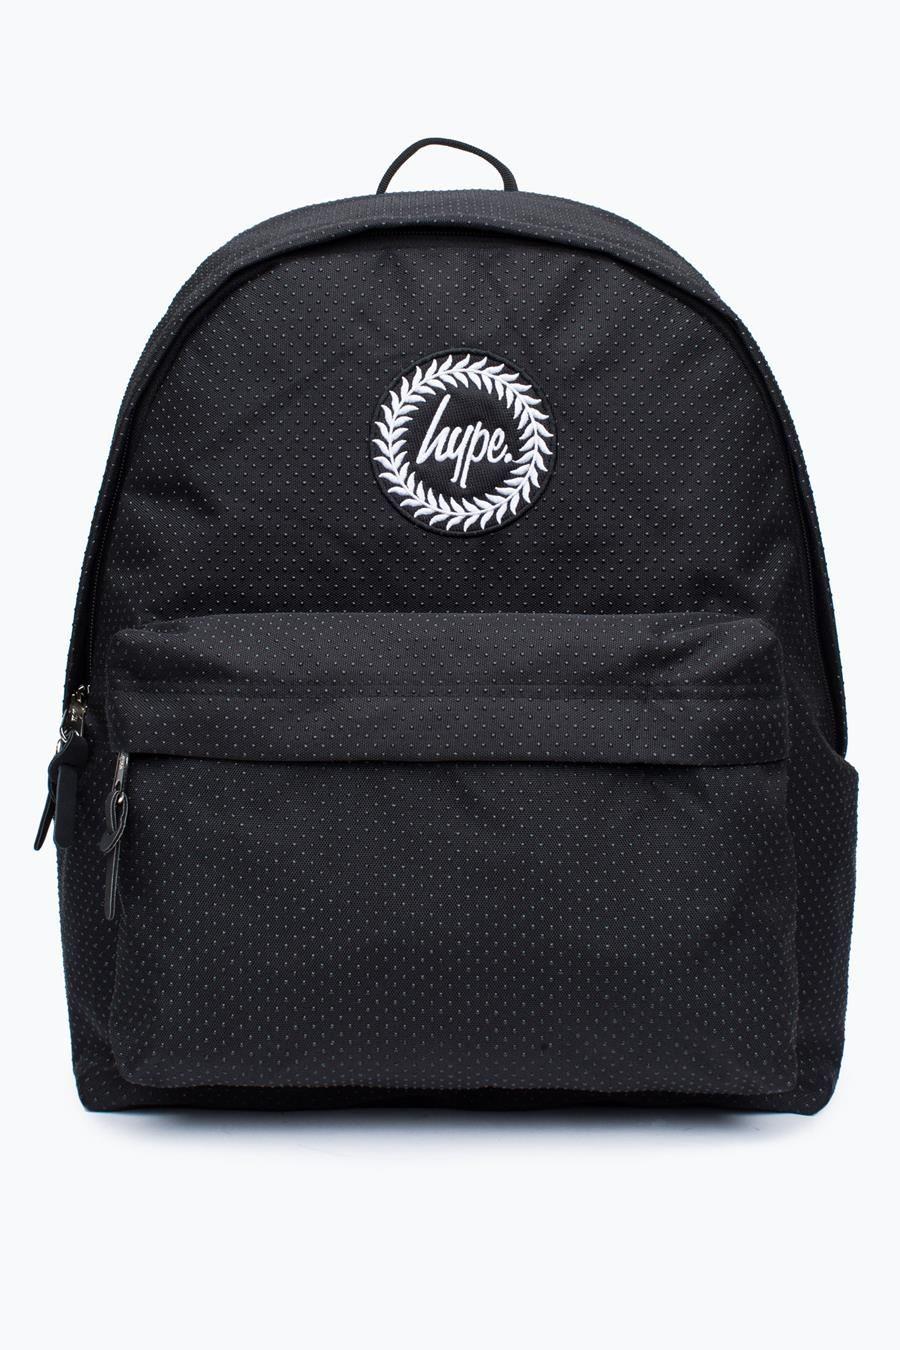 HYPE BLACK BLACK PEARL BACKPACK Hype Bags ba62334bb07dd